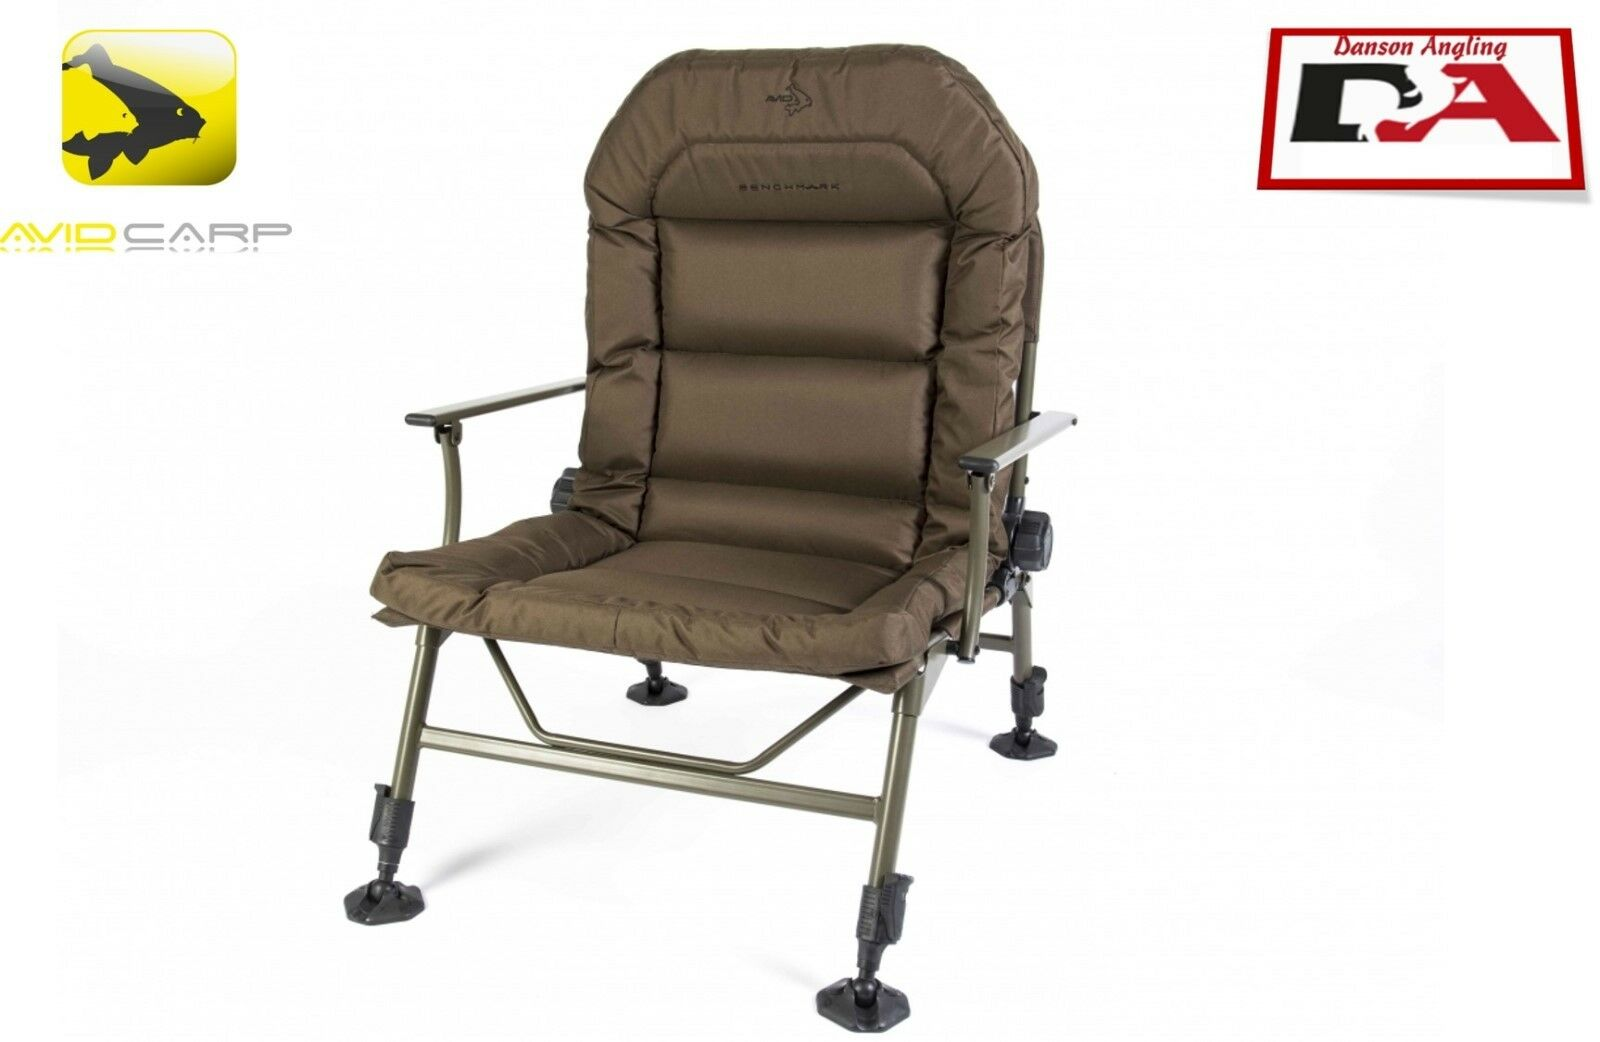 Avid A-Spec Chair A0440008 New Avid Carp Chair